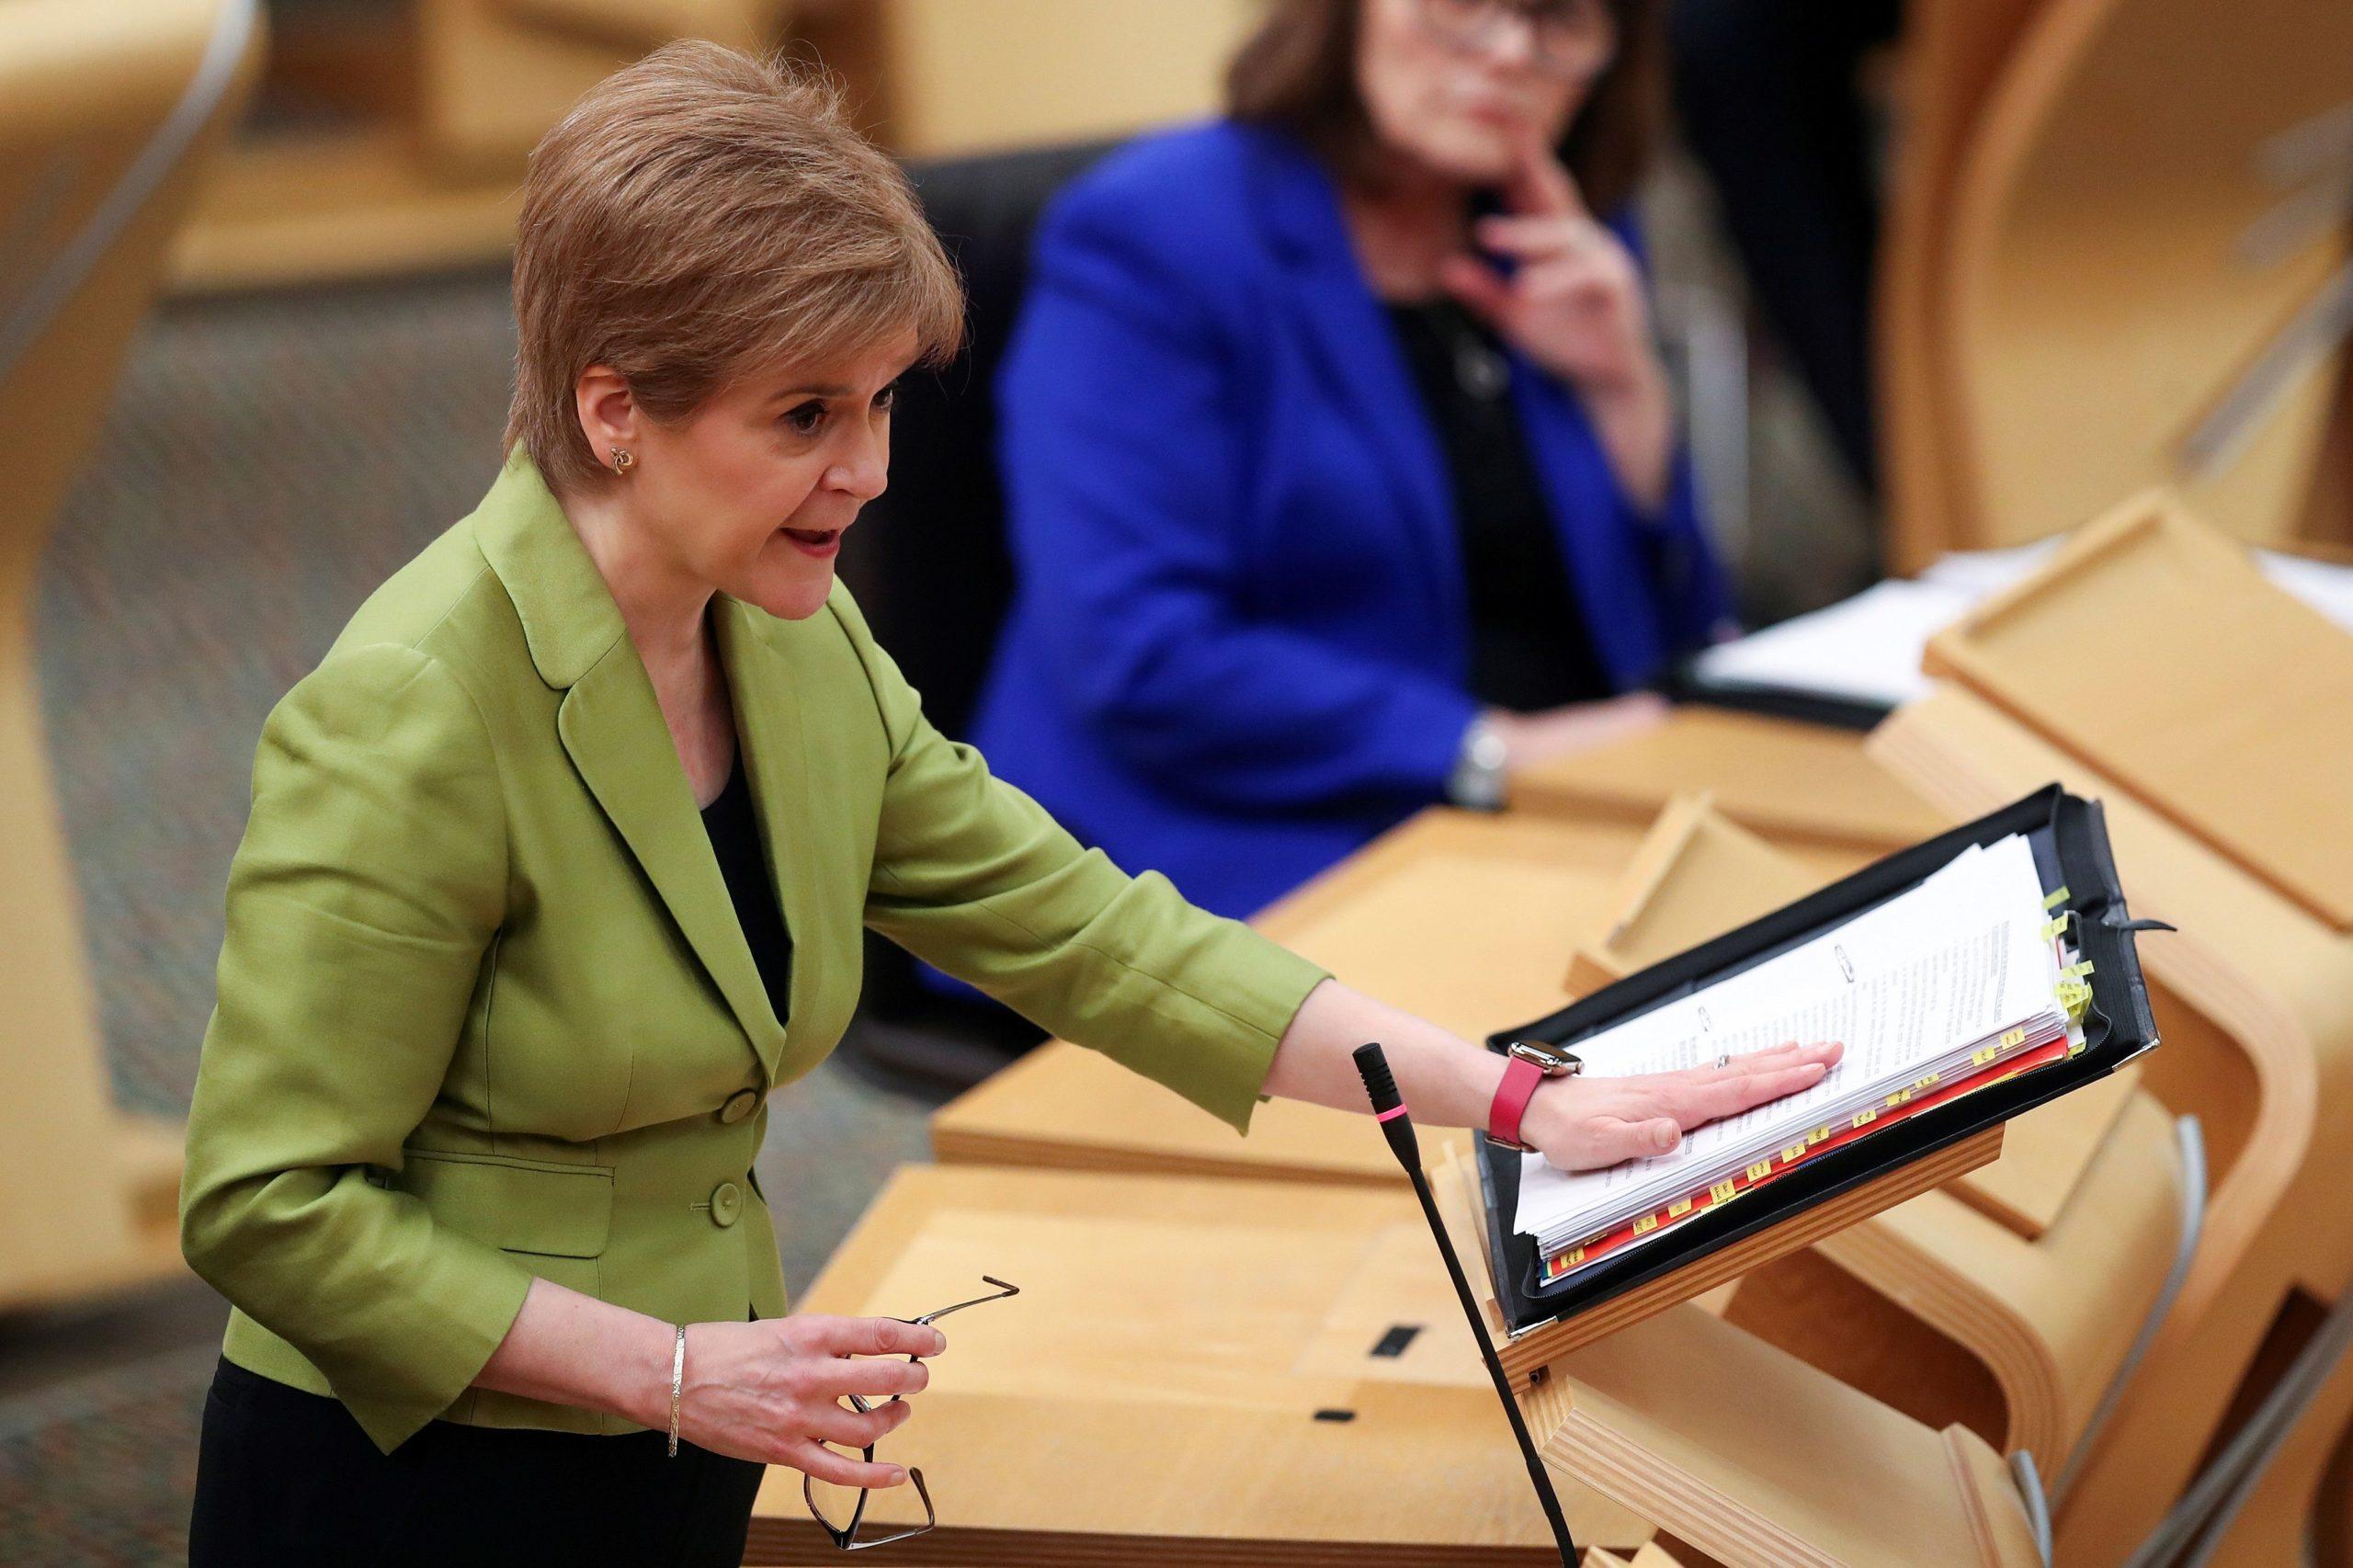 BRITAIN-SCOTLAND-POLITICS-HEALTH-VIRUS